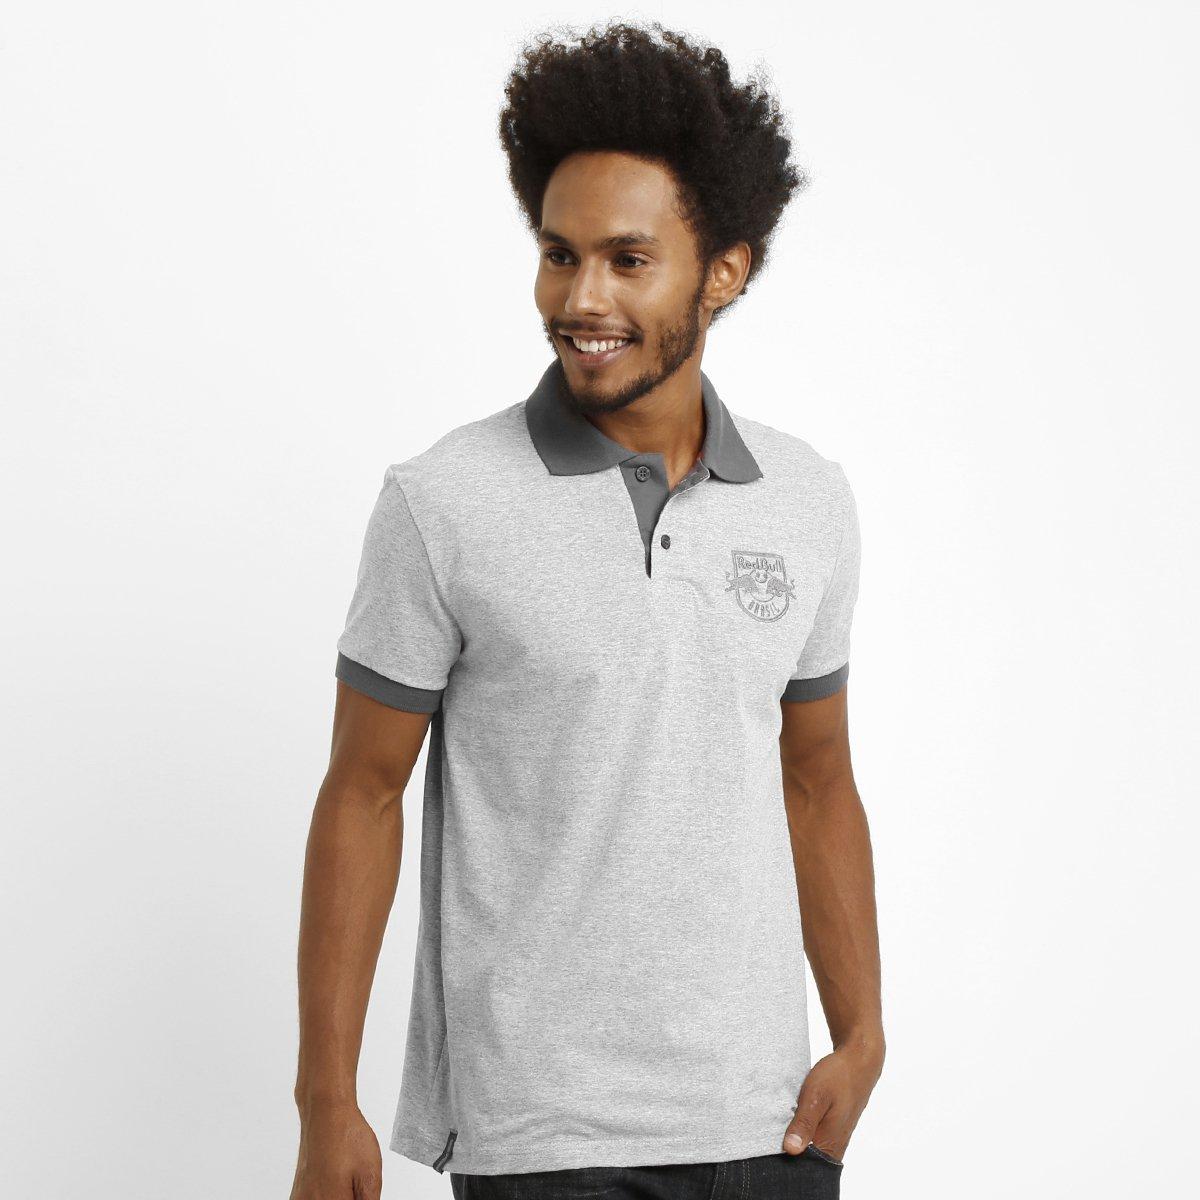 845cfa77d90ef Camisa Polo Red Bull Basic - Compre Agora